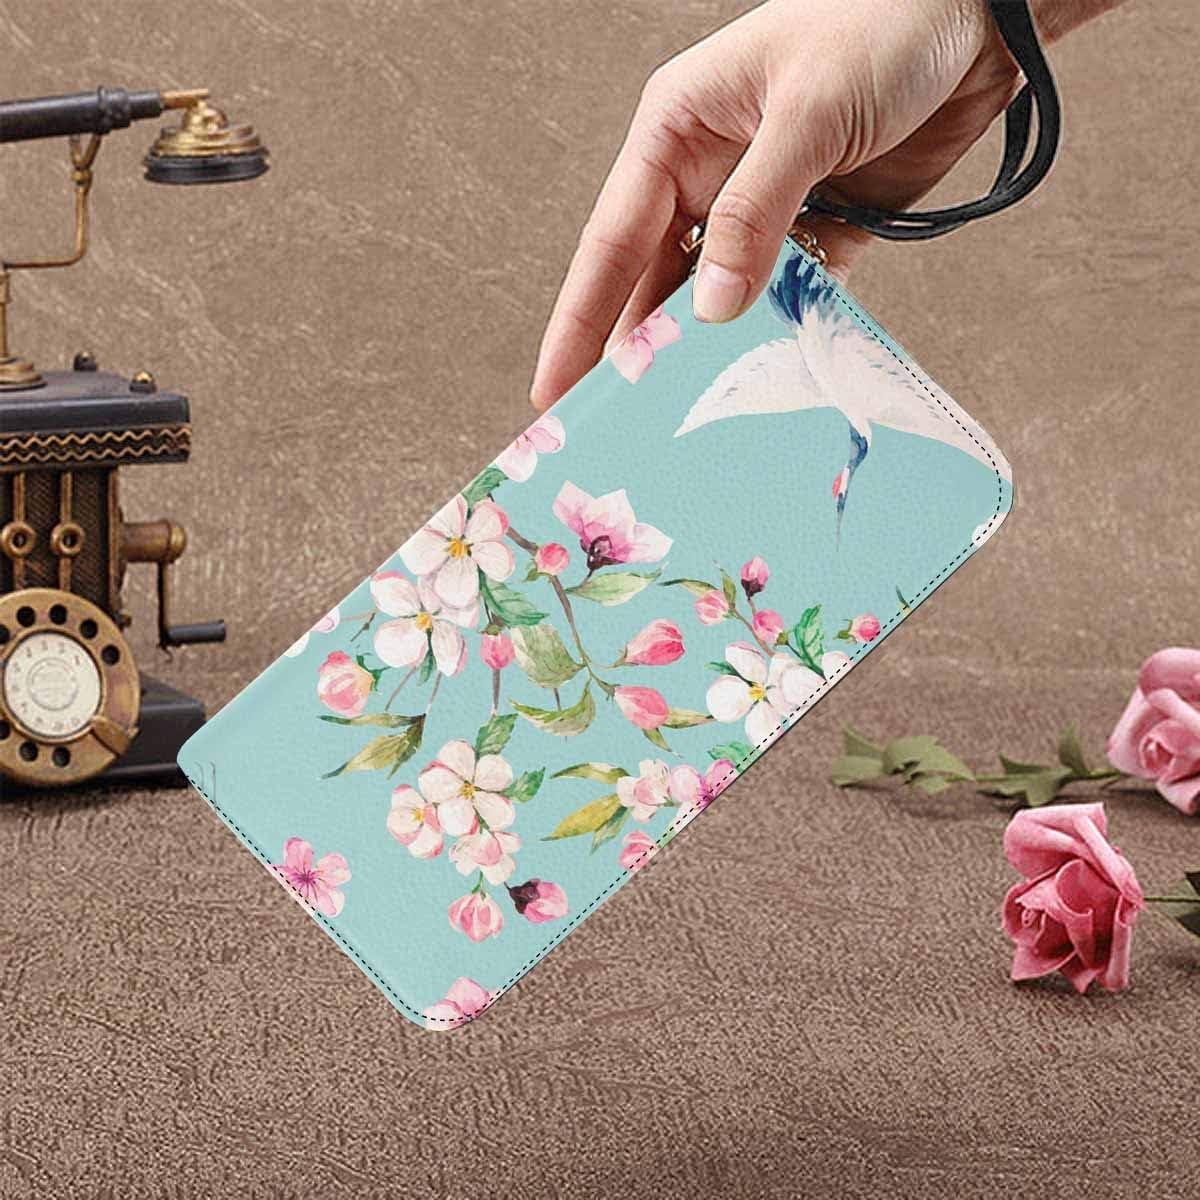 InterestPrint Womens Crane with Flowers Clutch Purse